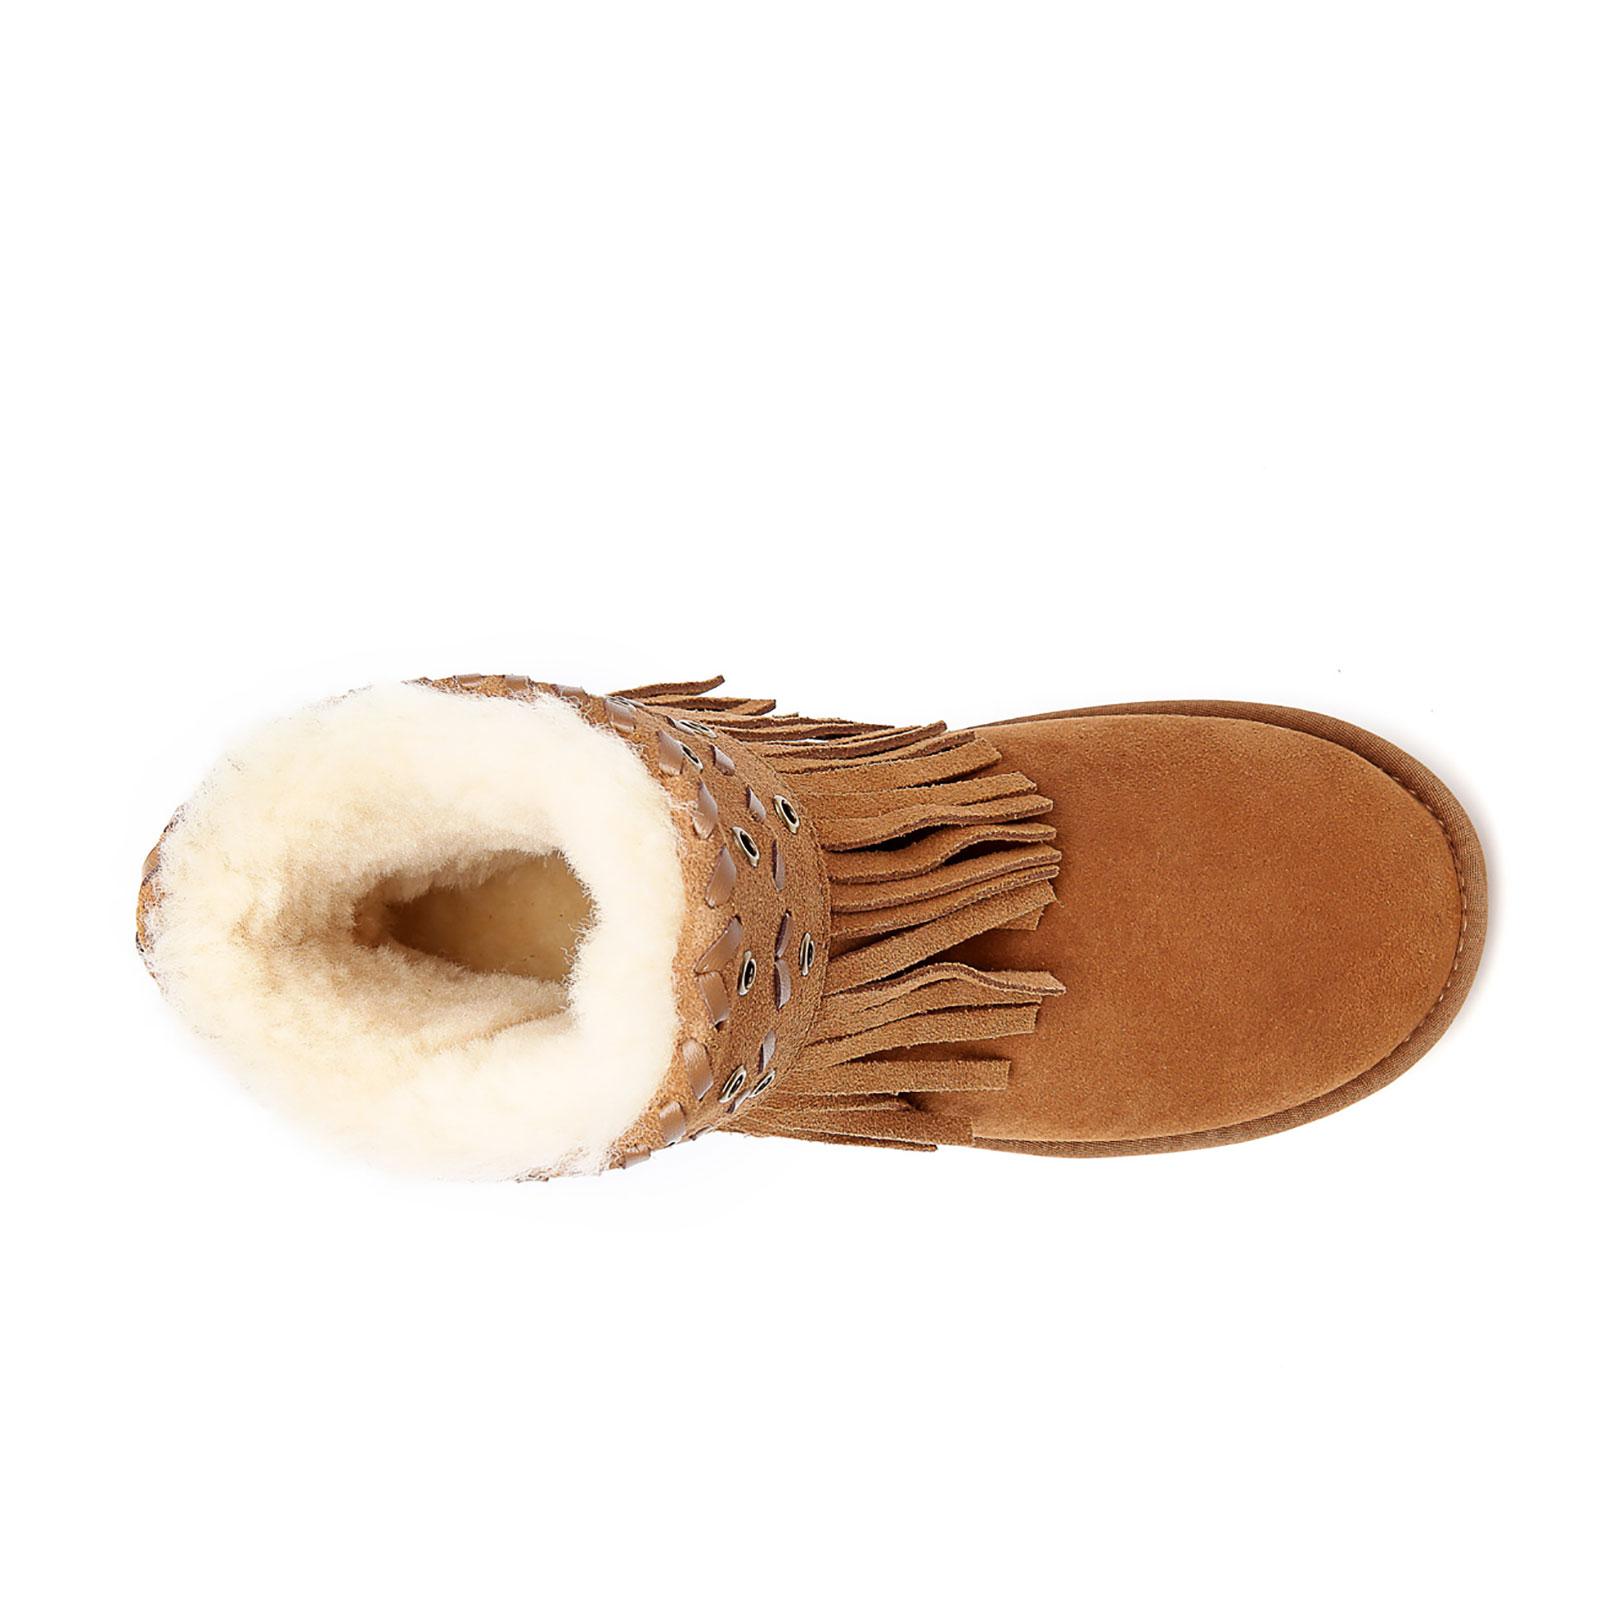 UGG-Boots-Trinity-Ladies-Ankle-Sheepskin-Australian-Double-